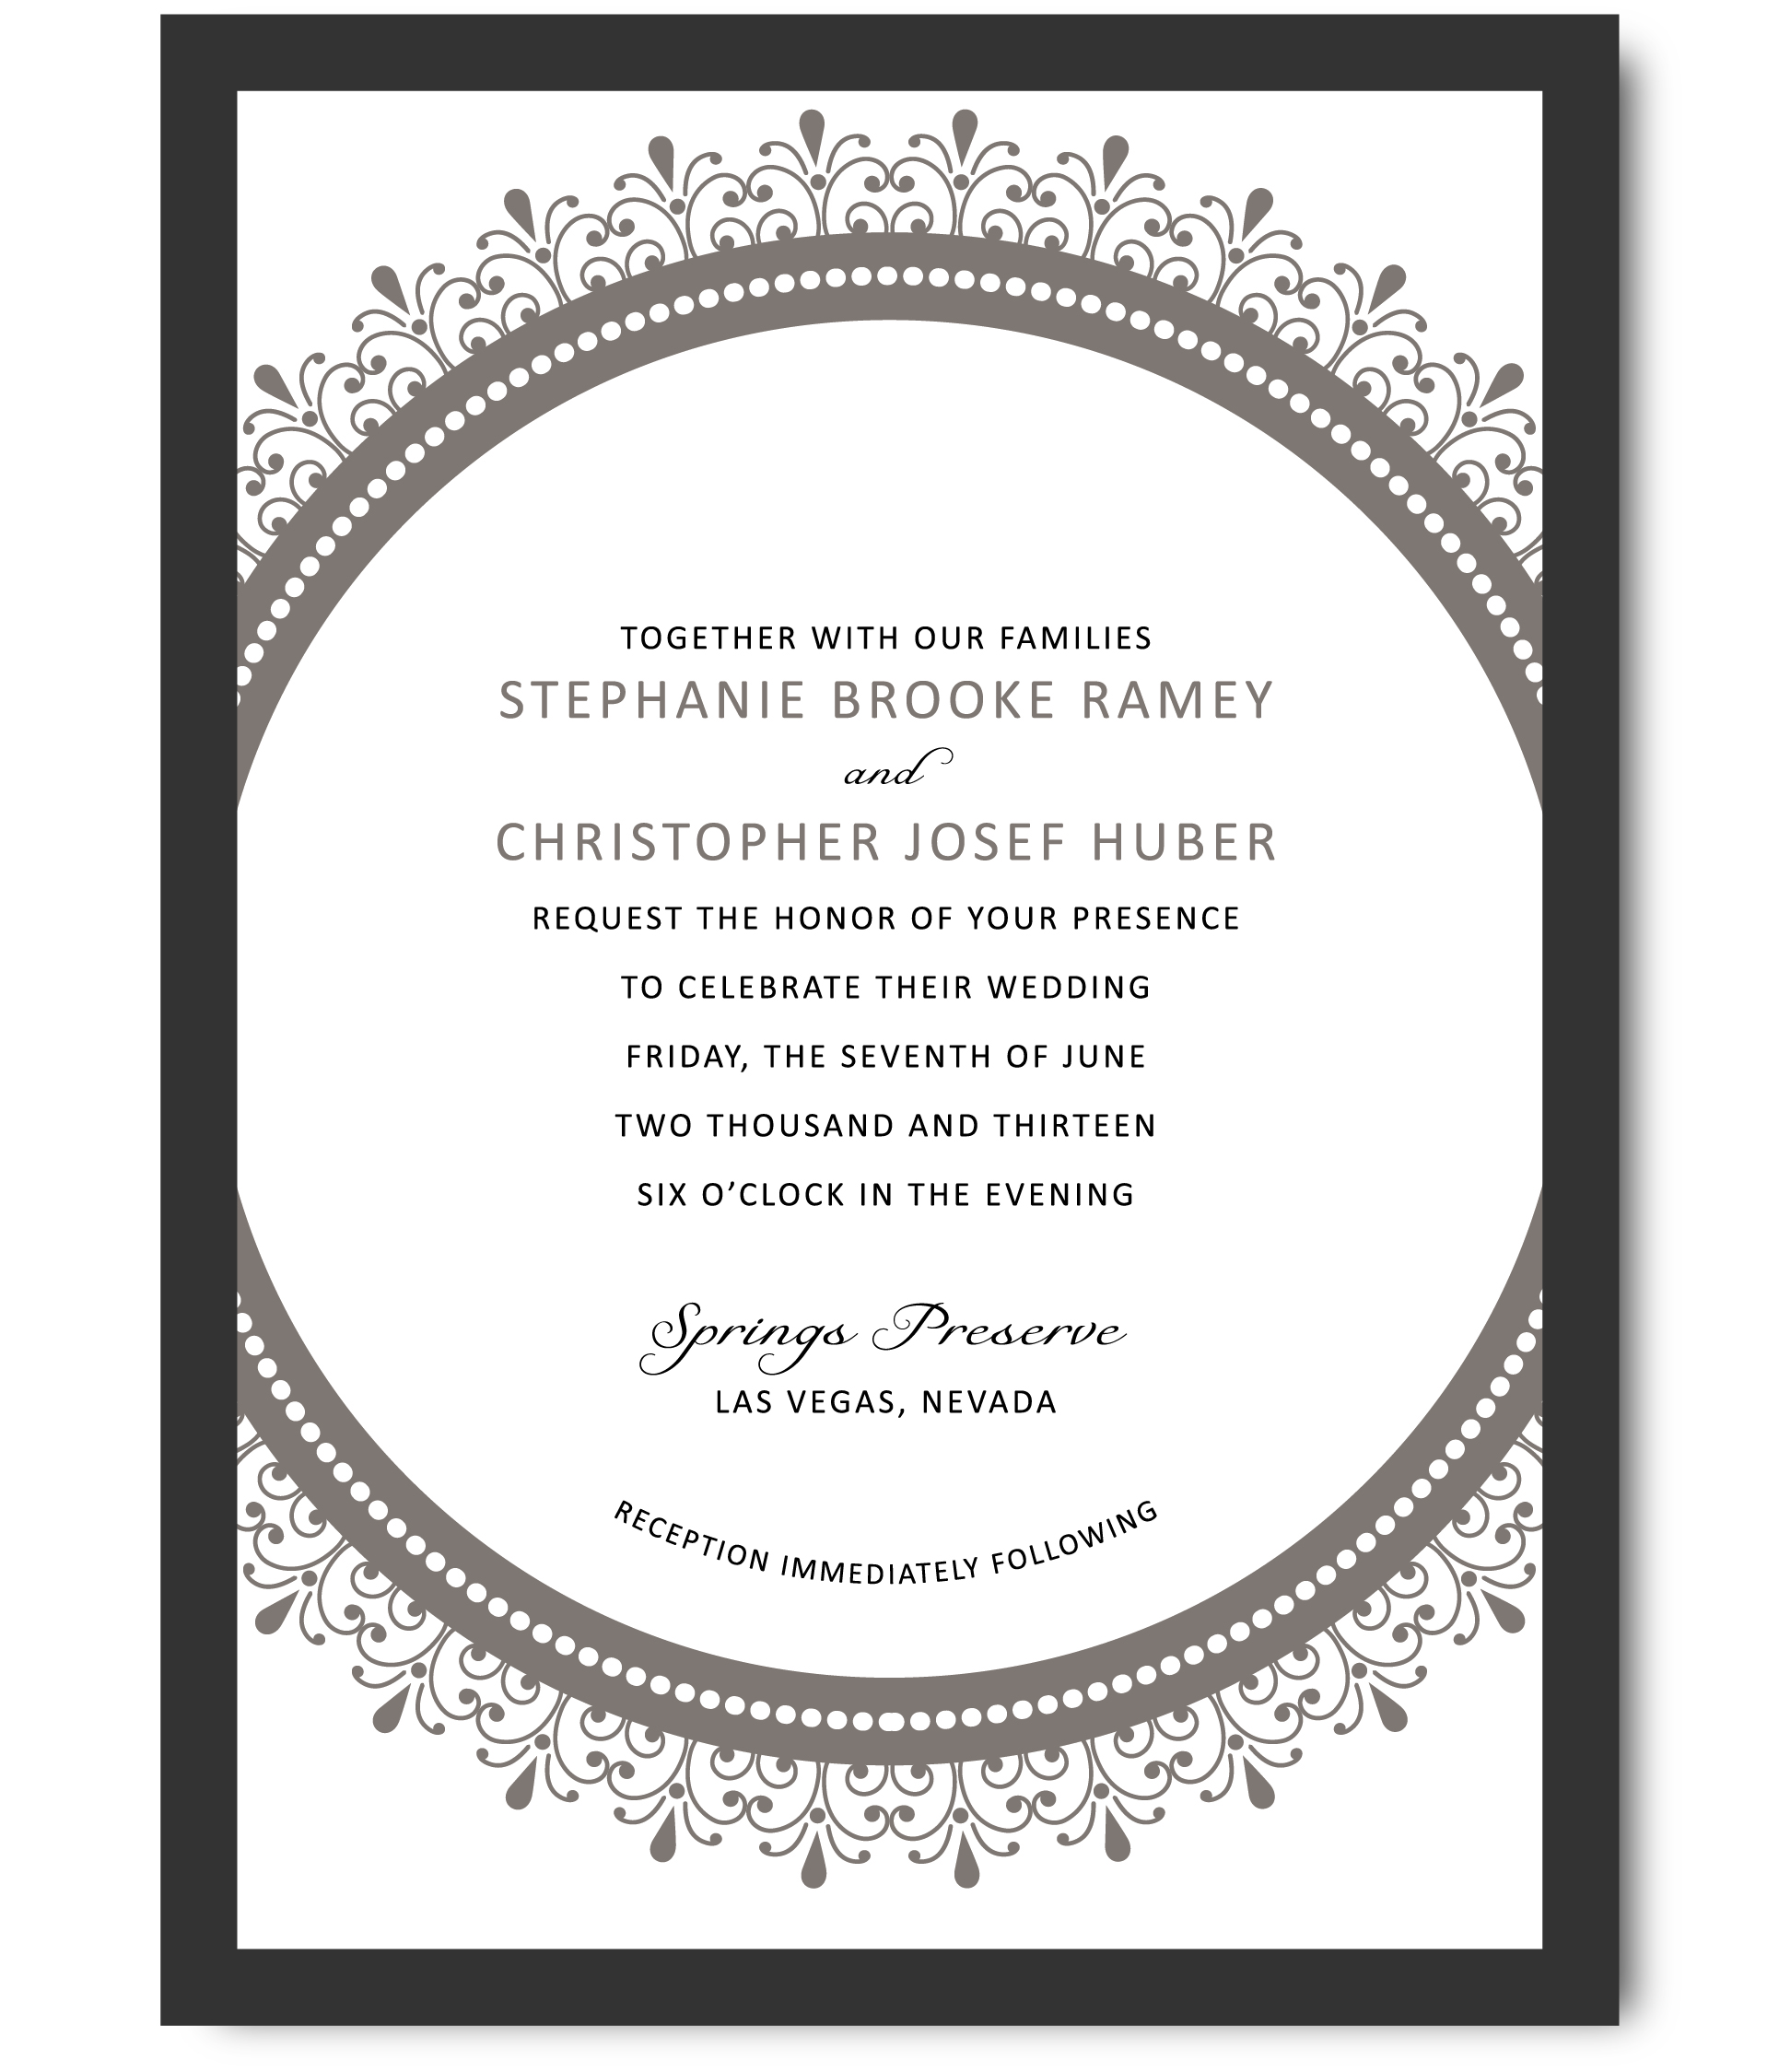 StephanieR.Wedding.jpg